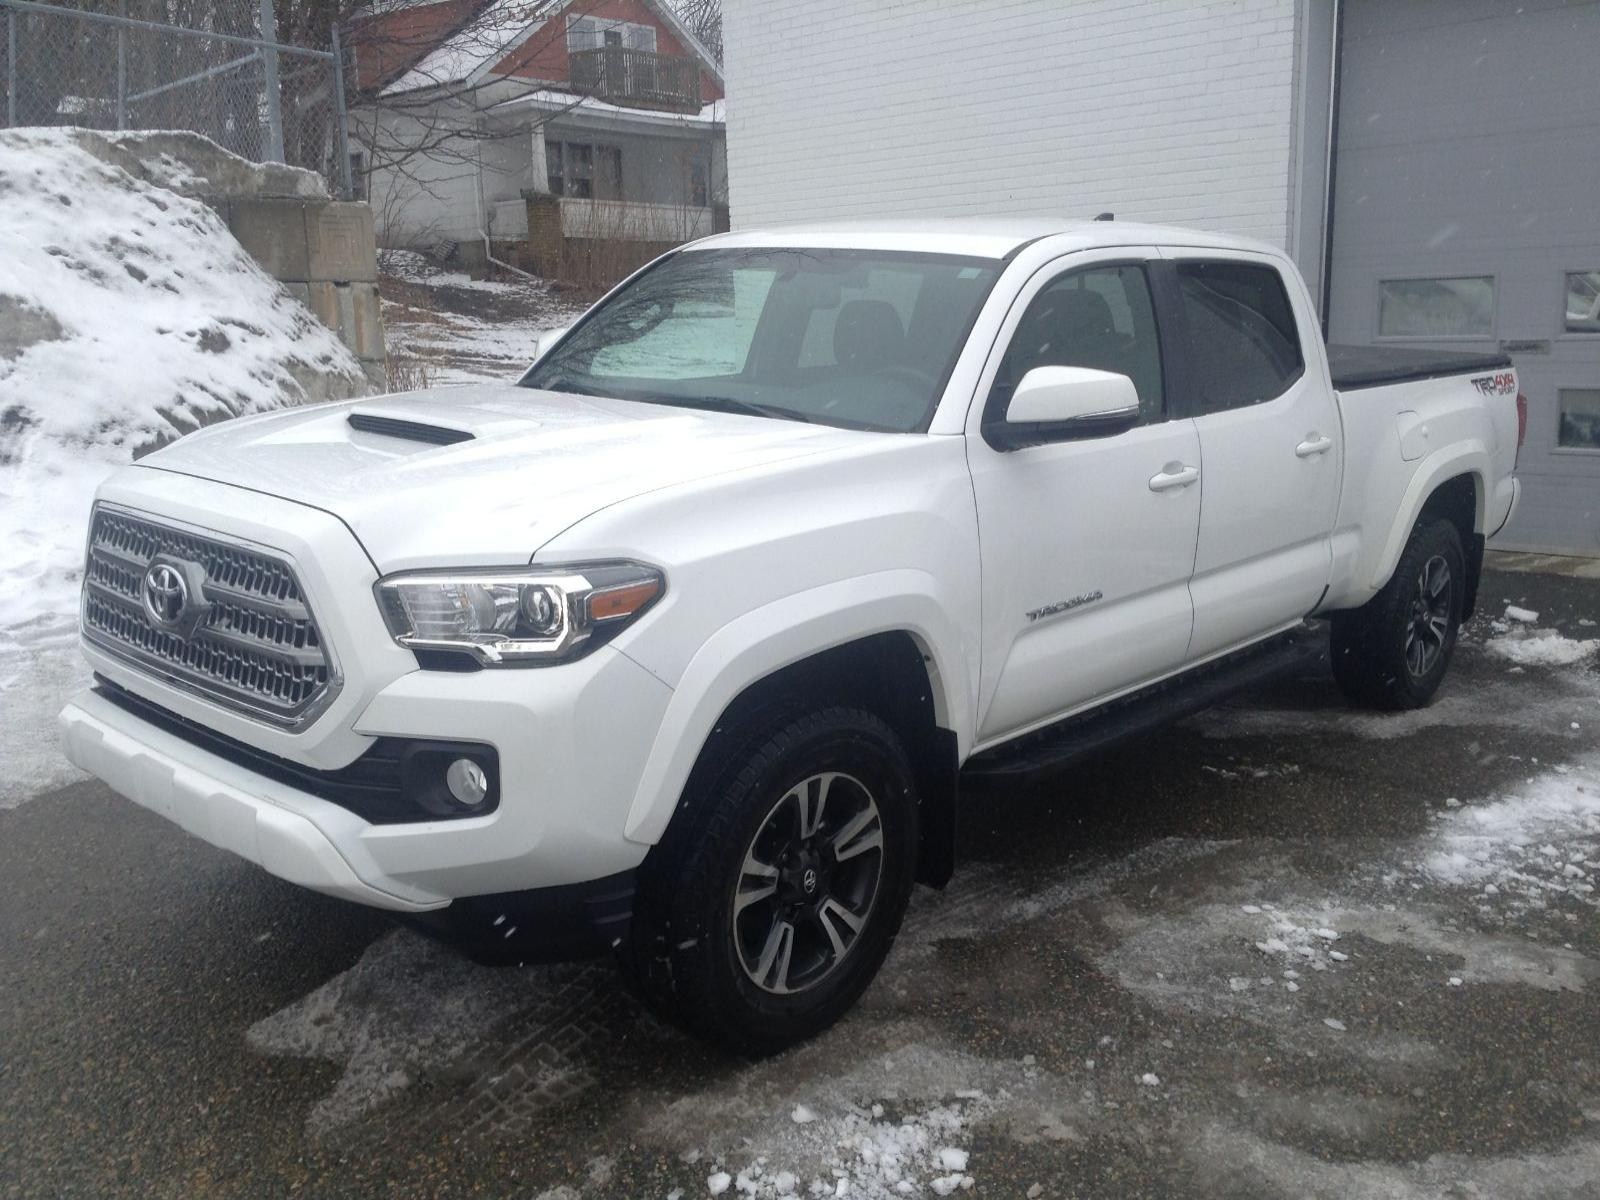 Used 2017 Toyota Tacoma in Sherbrooke,QC